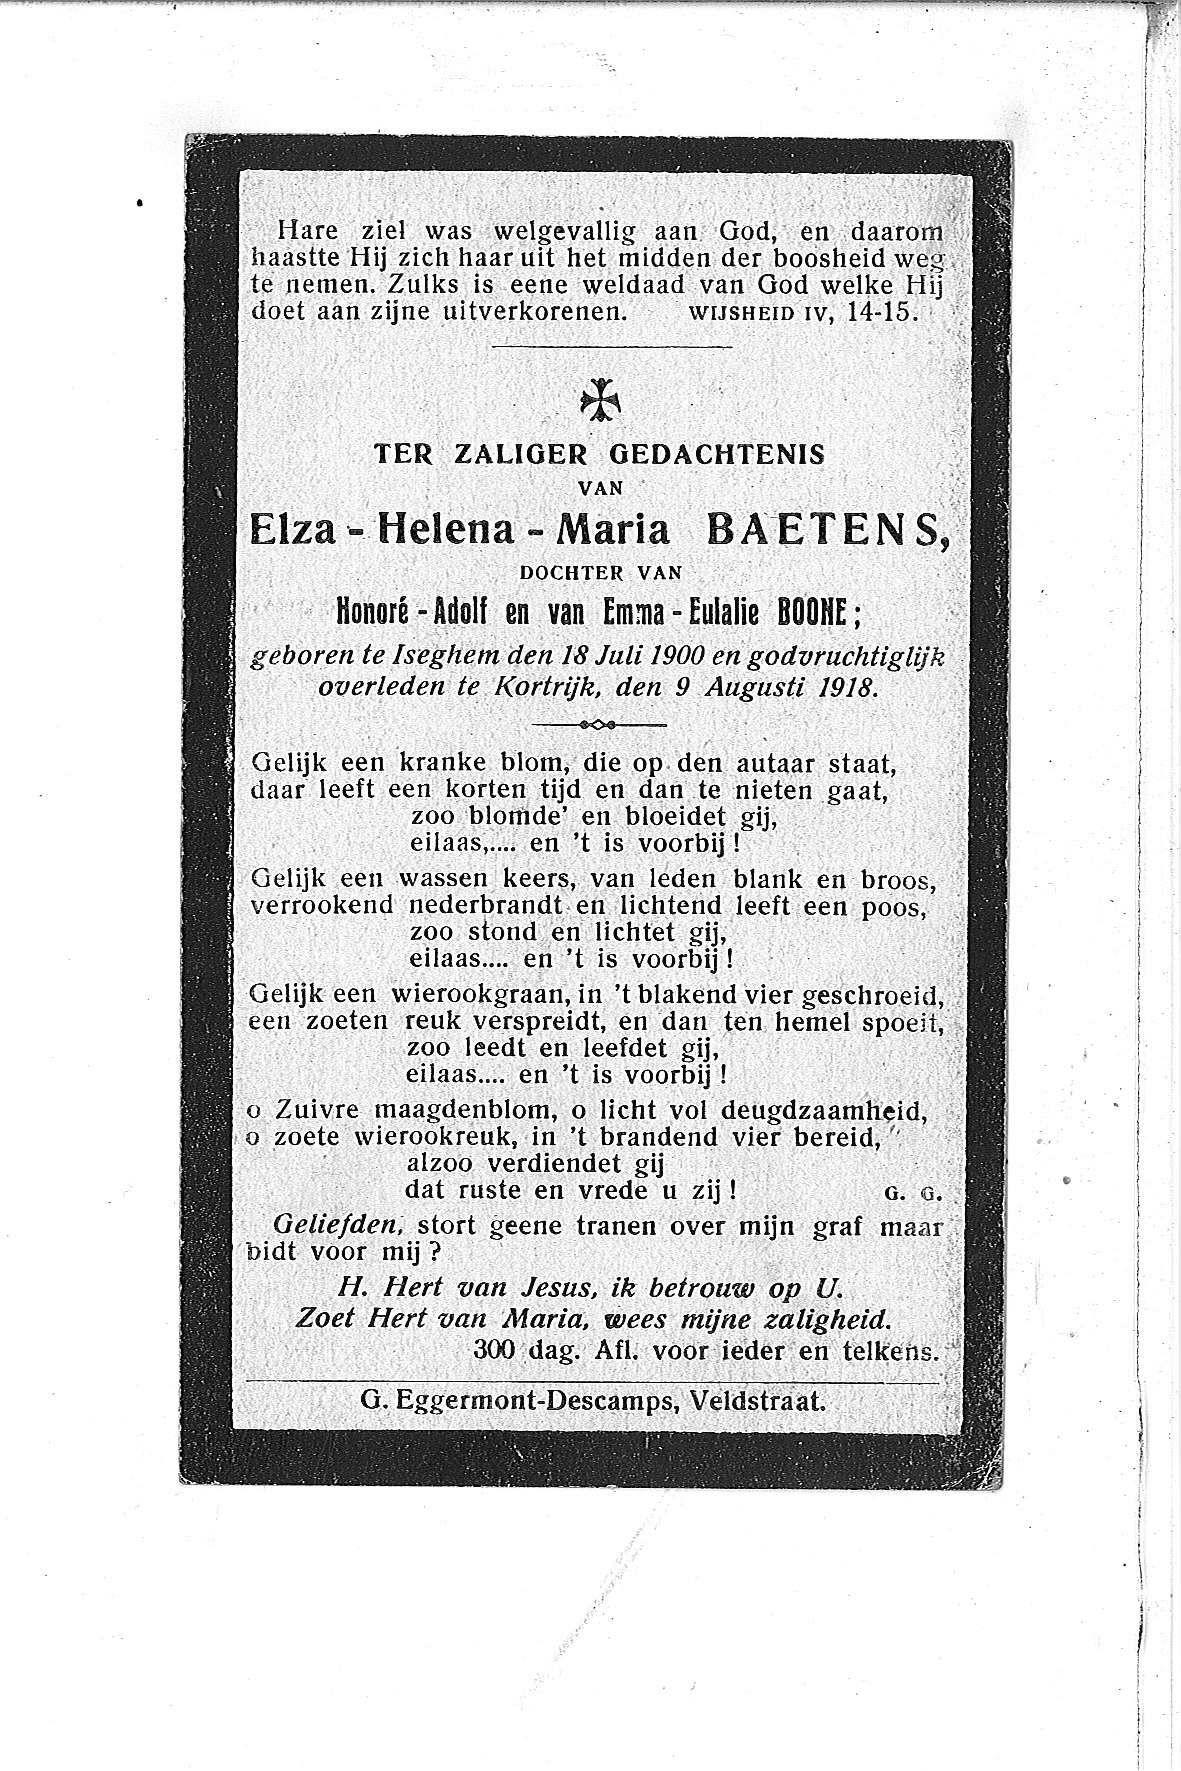 Elza-Helena-Maria(1918)20101004083859_00020.jpg